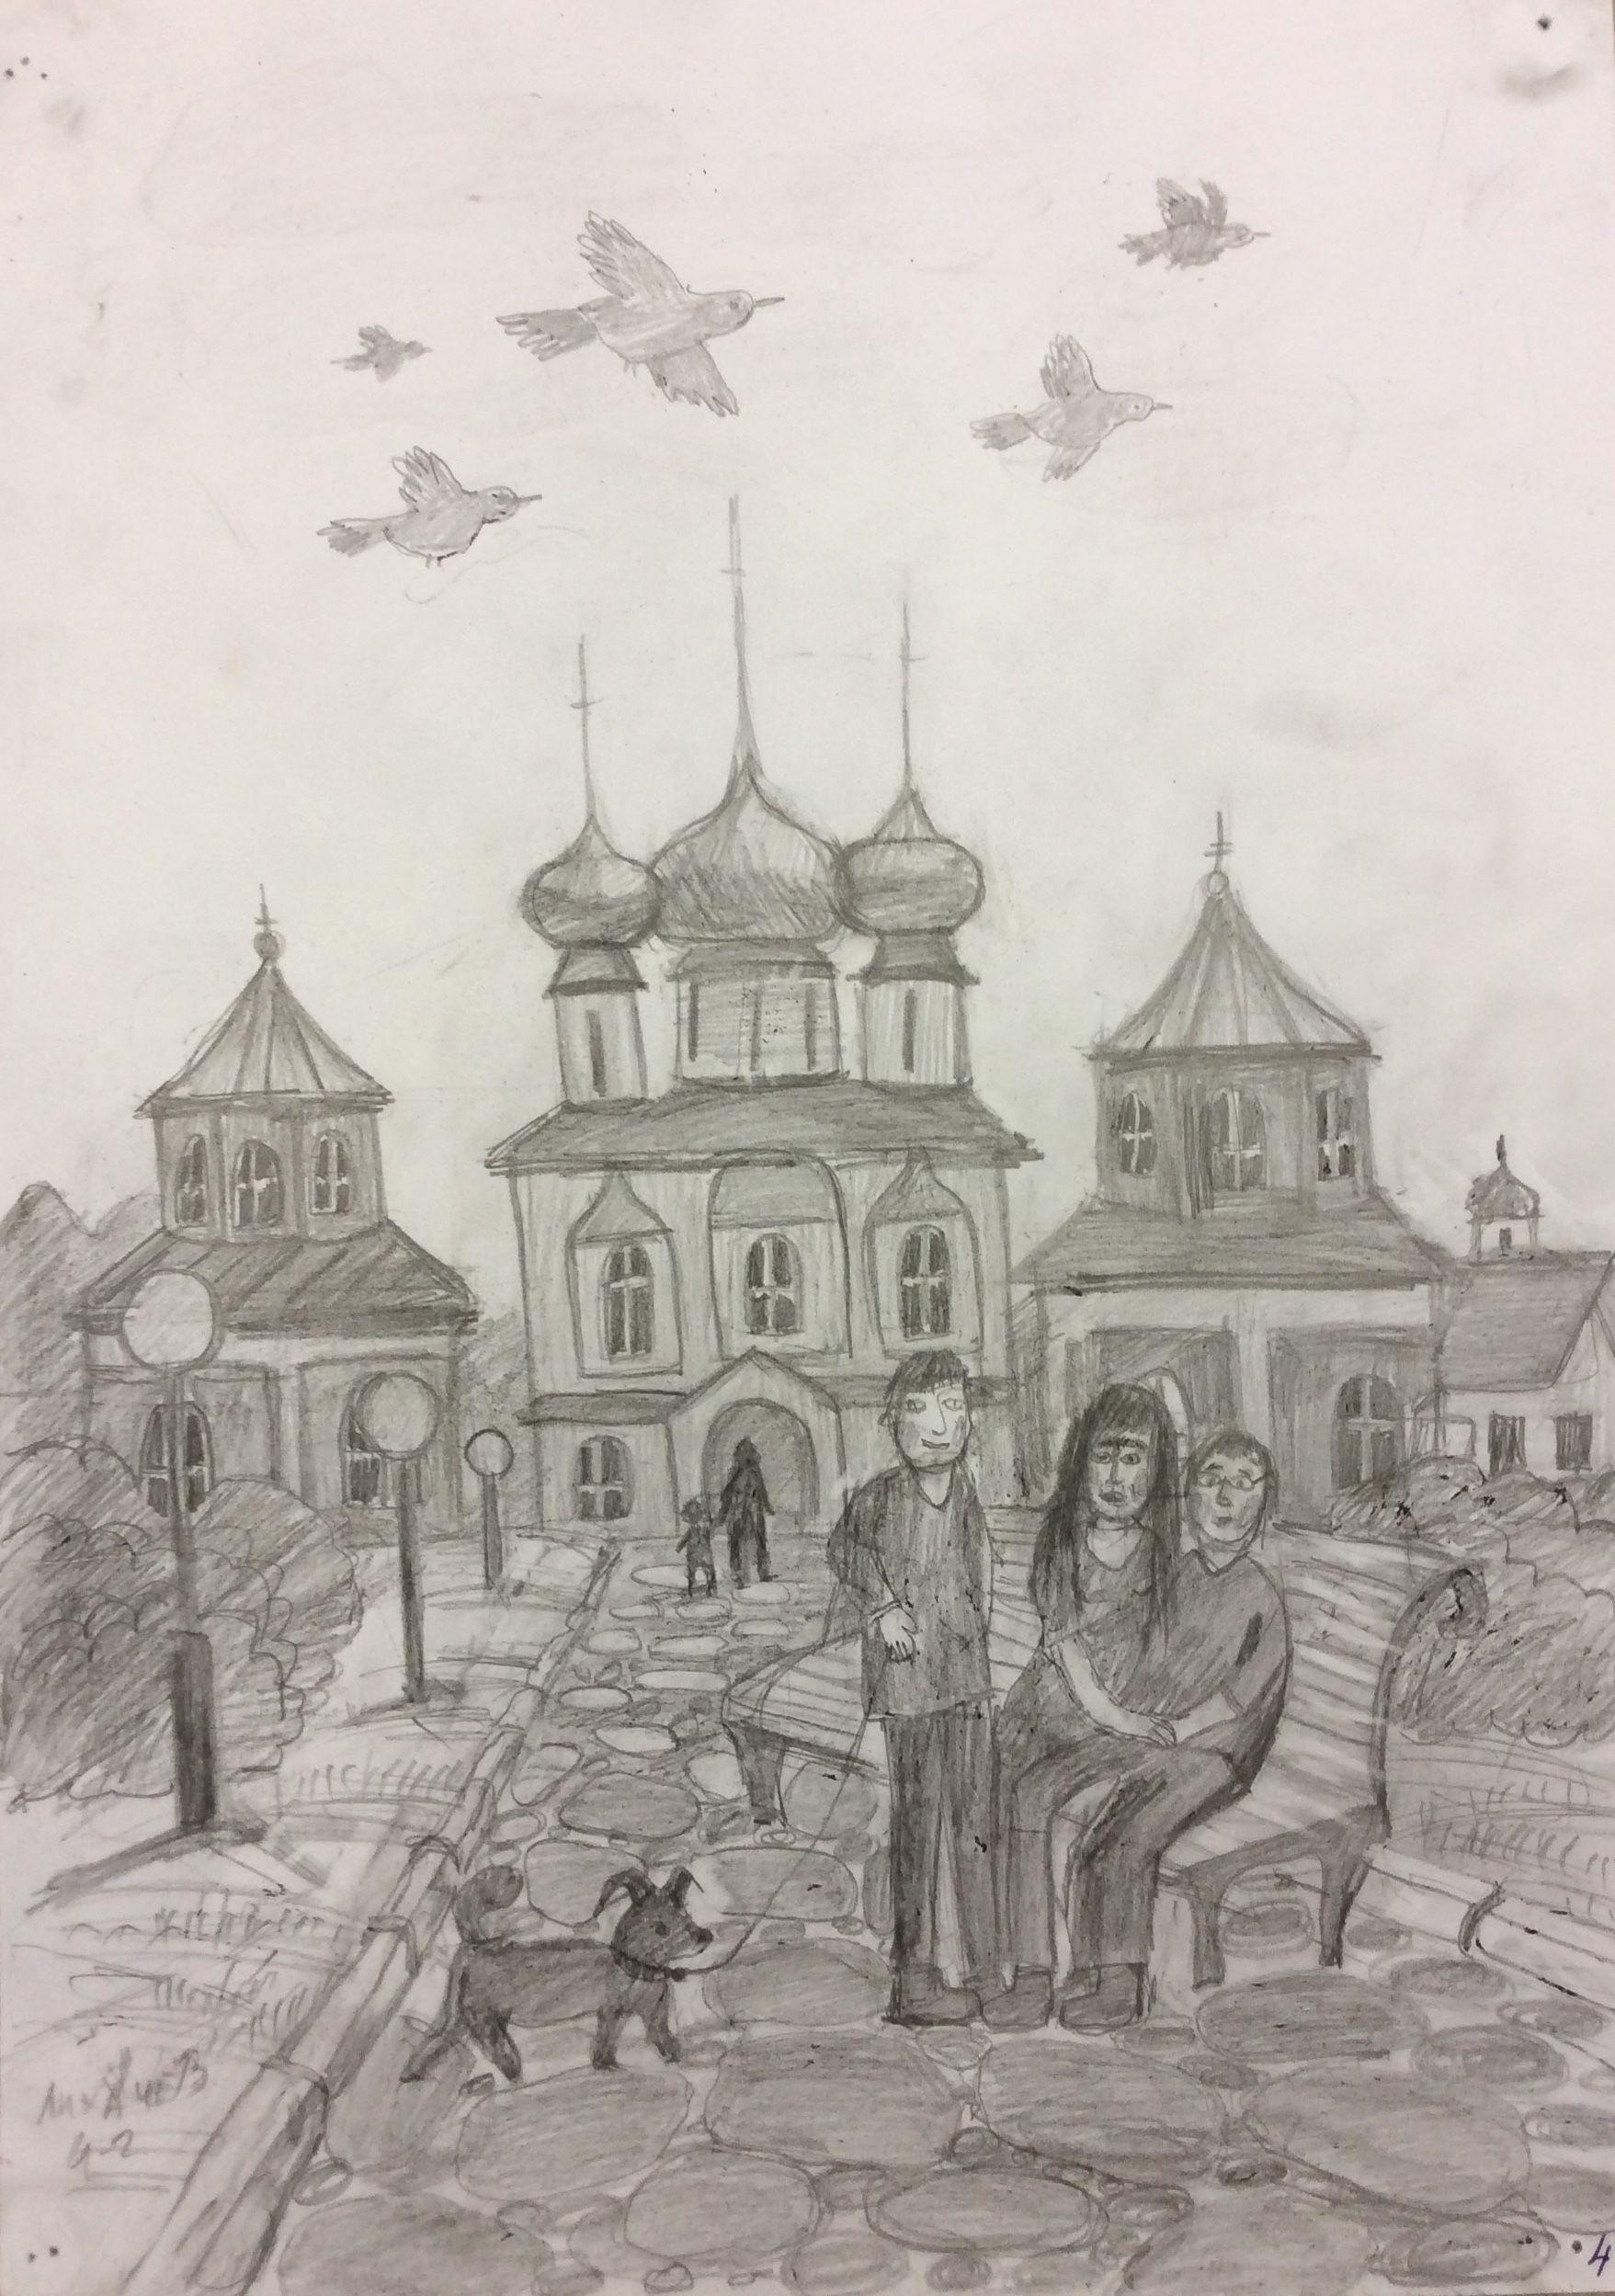 «Прогулка по монастырю», Лихачев Тихон (12 лет), карандаш, преп. С. А. Латыпова